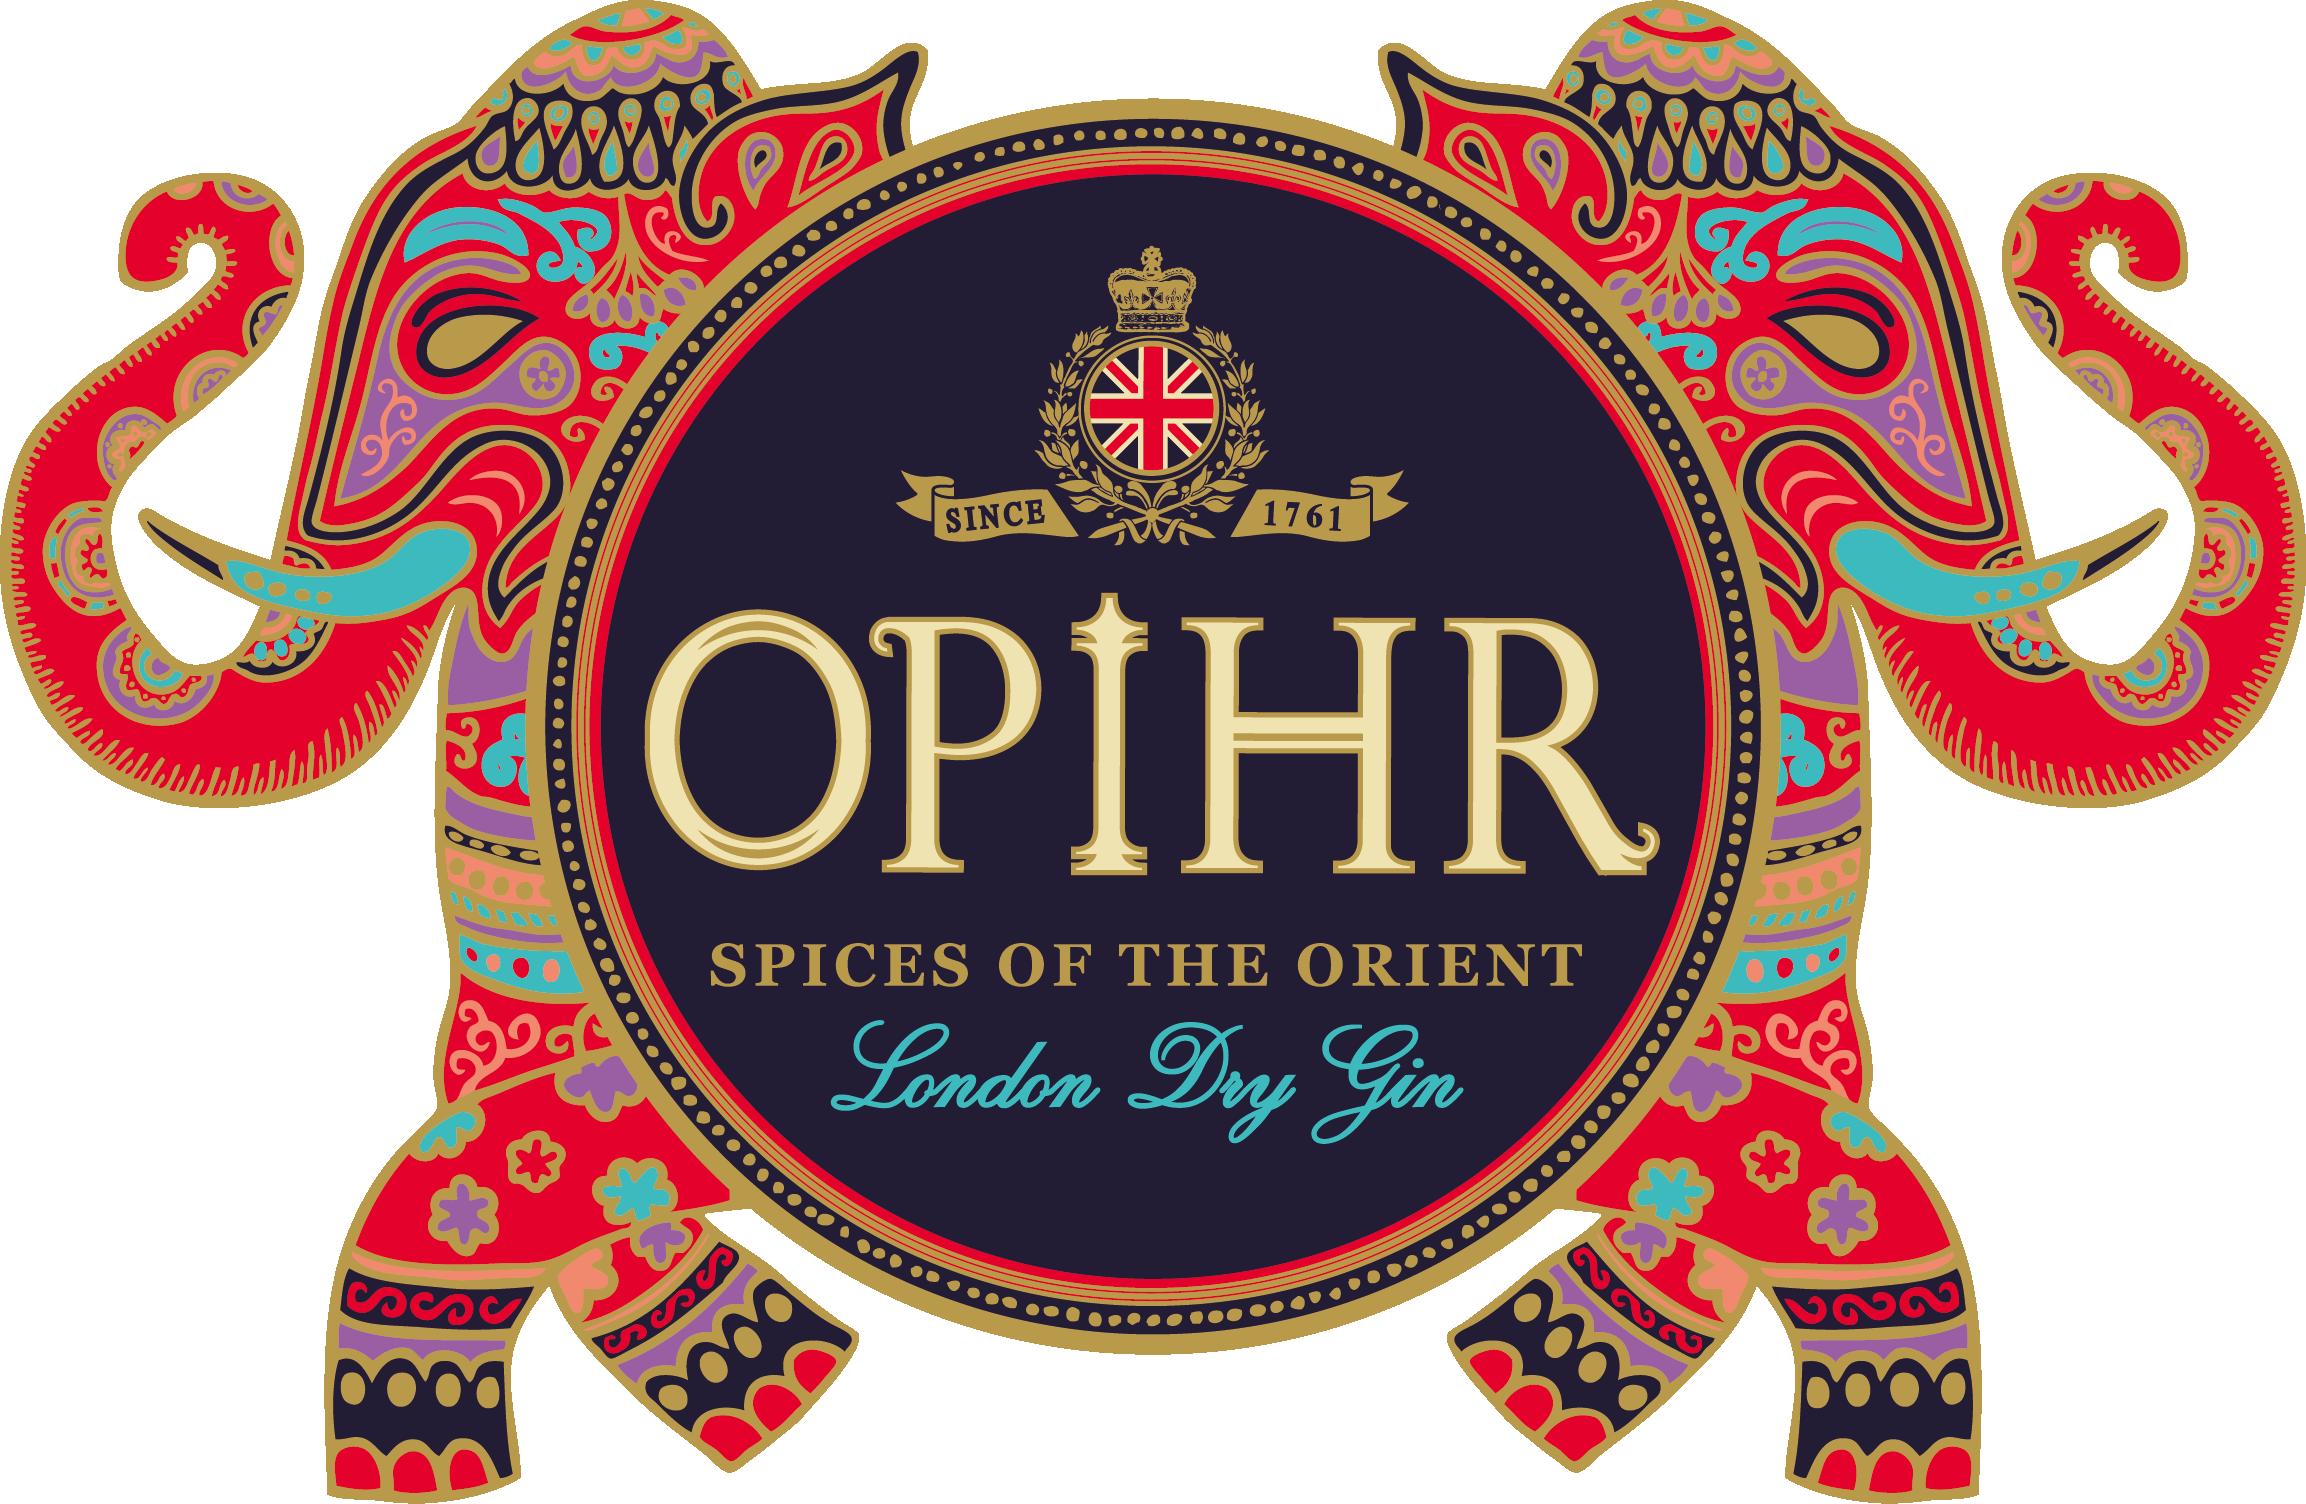 OPIHR_Brand_logo_2018 (2).png